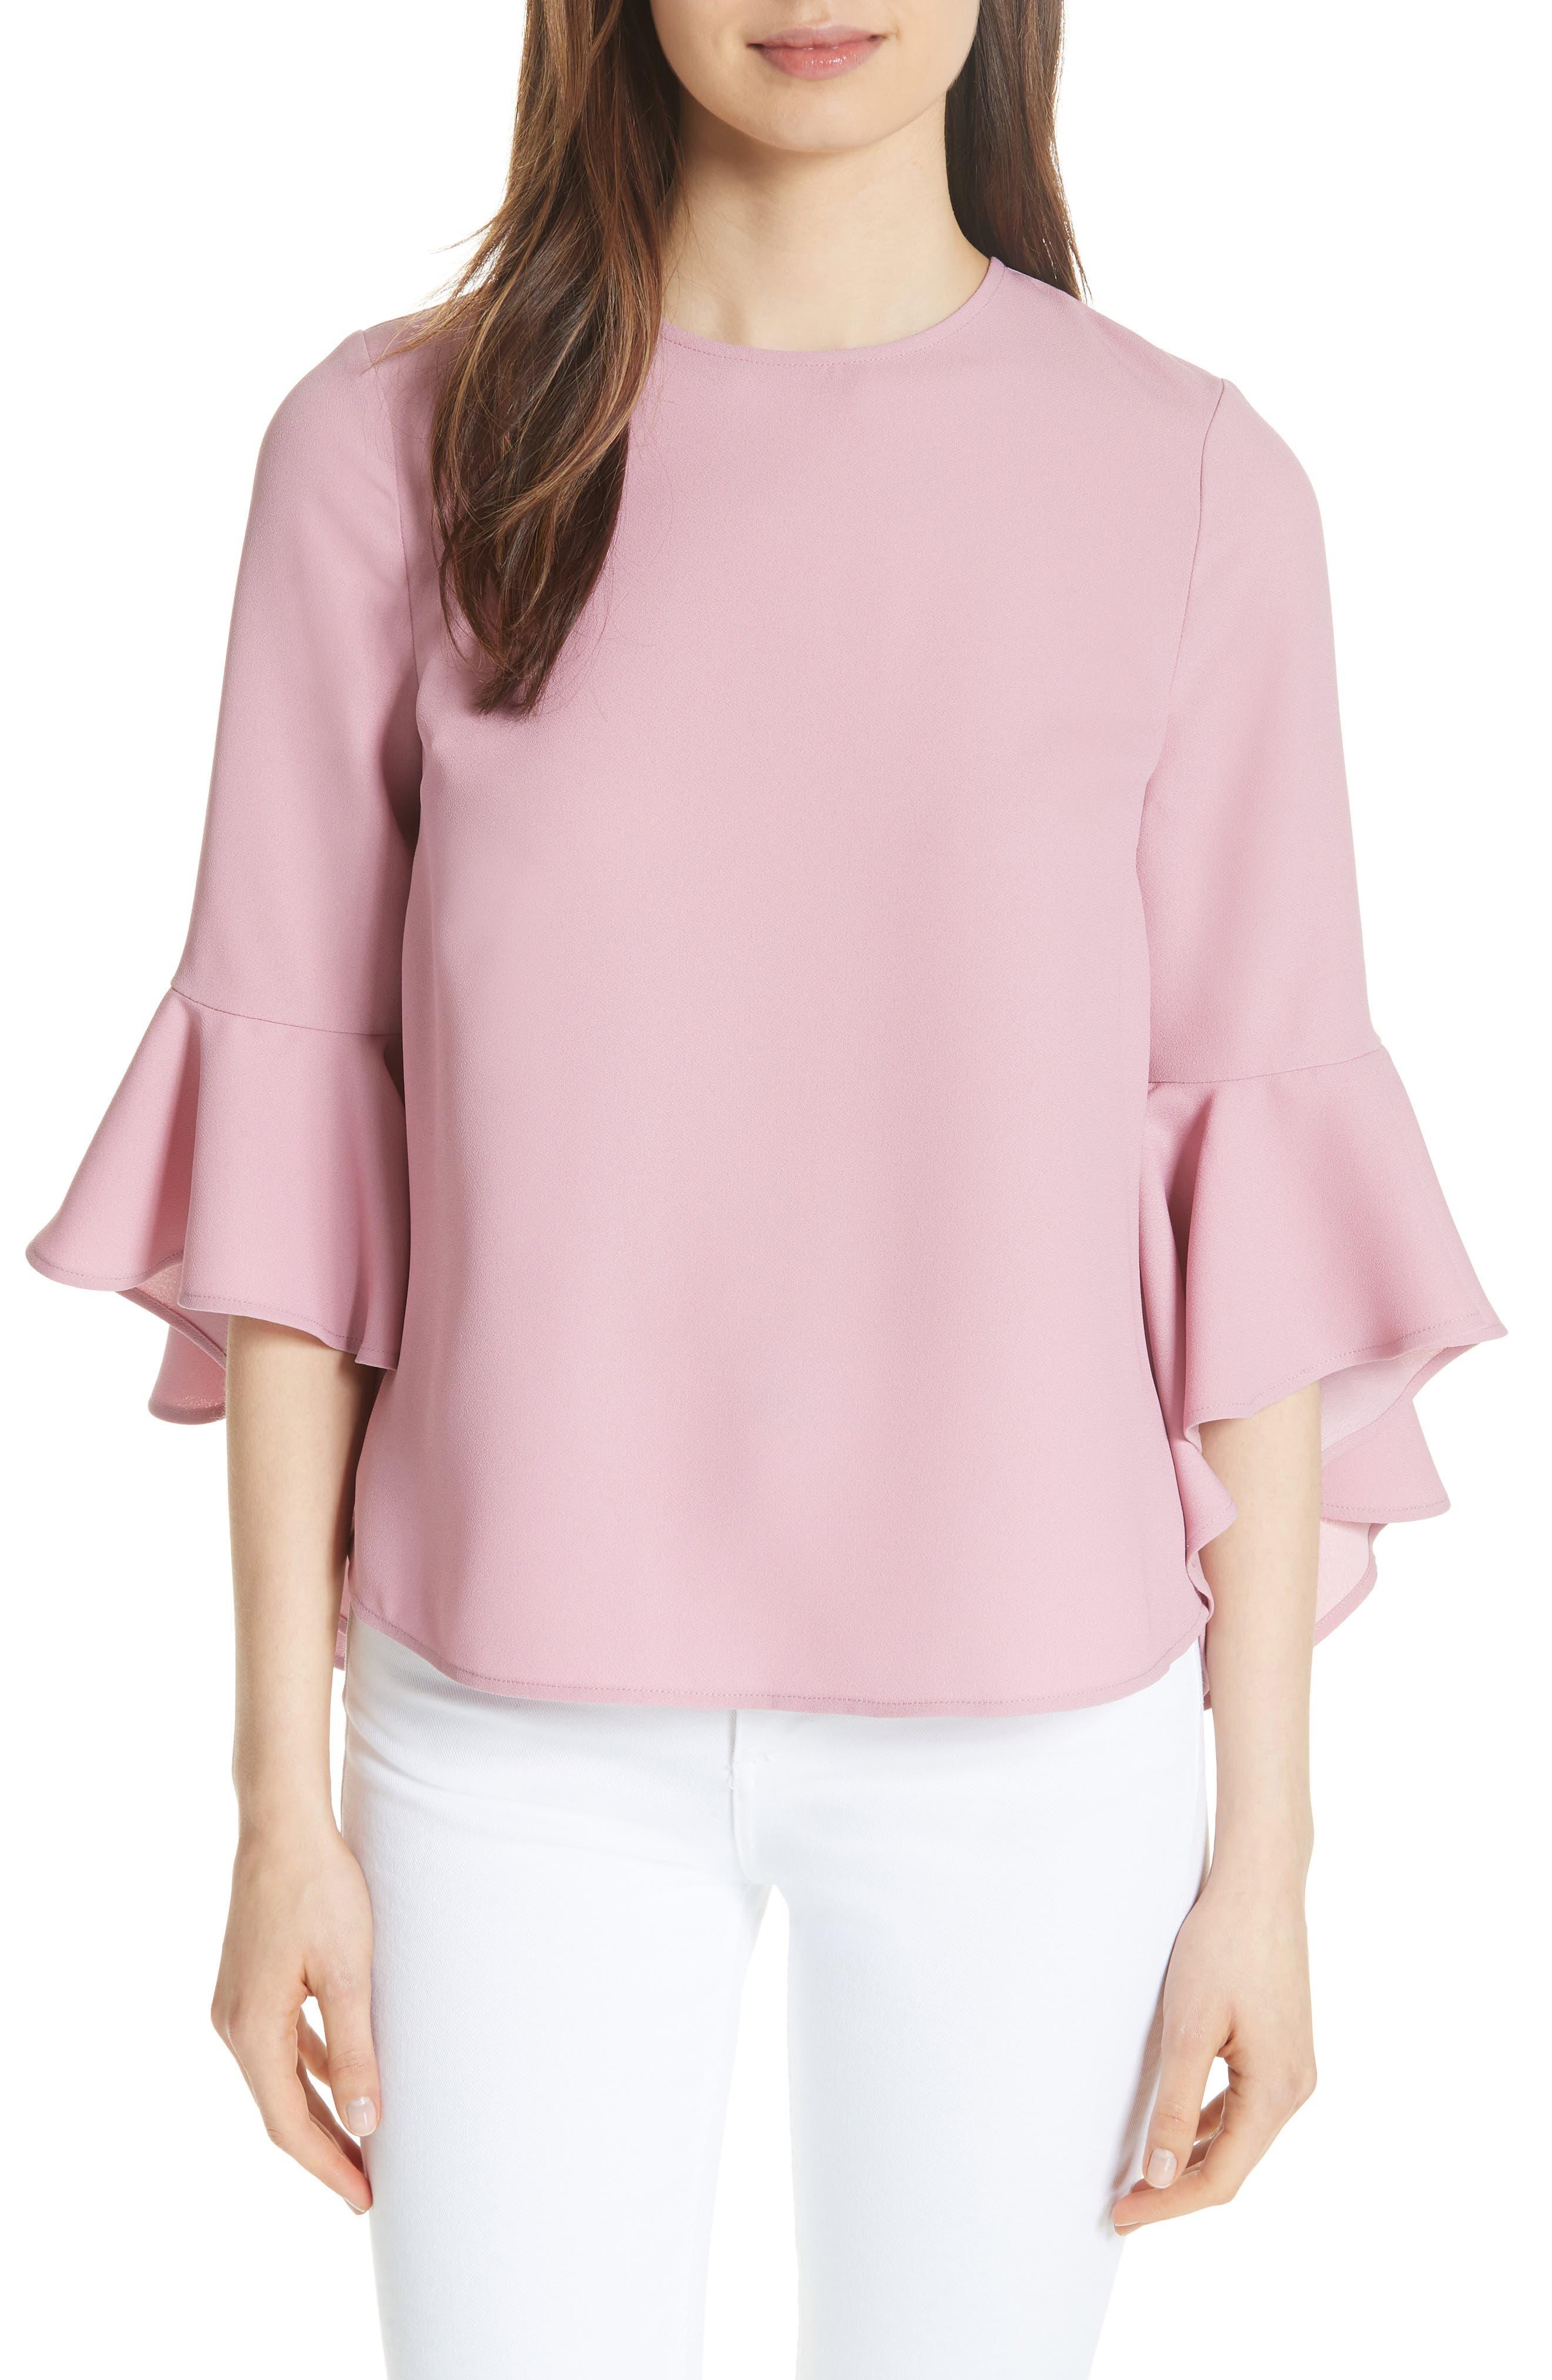 Juula Waterfall Sleeve Top,                         Main,                         color, Dusky Pink